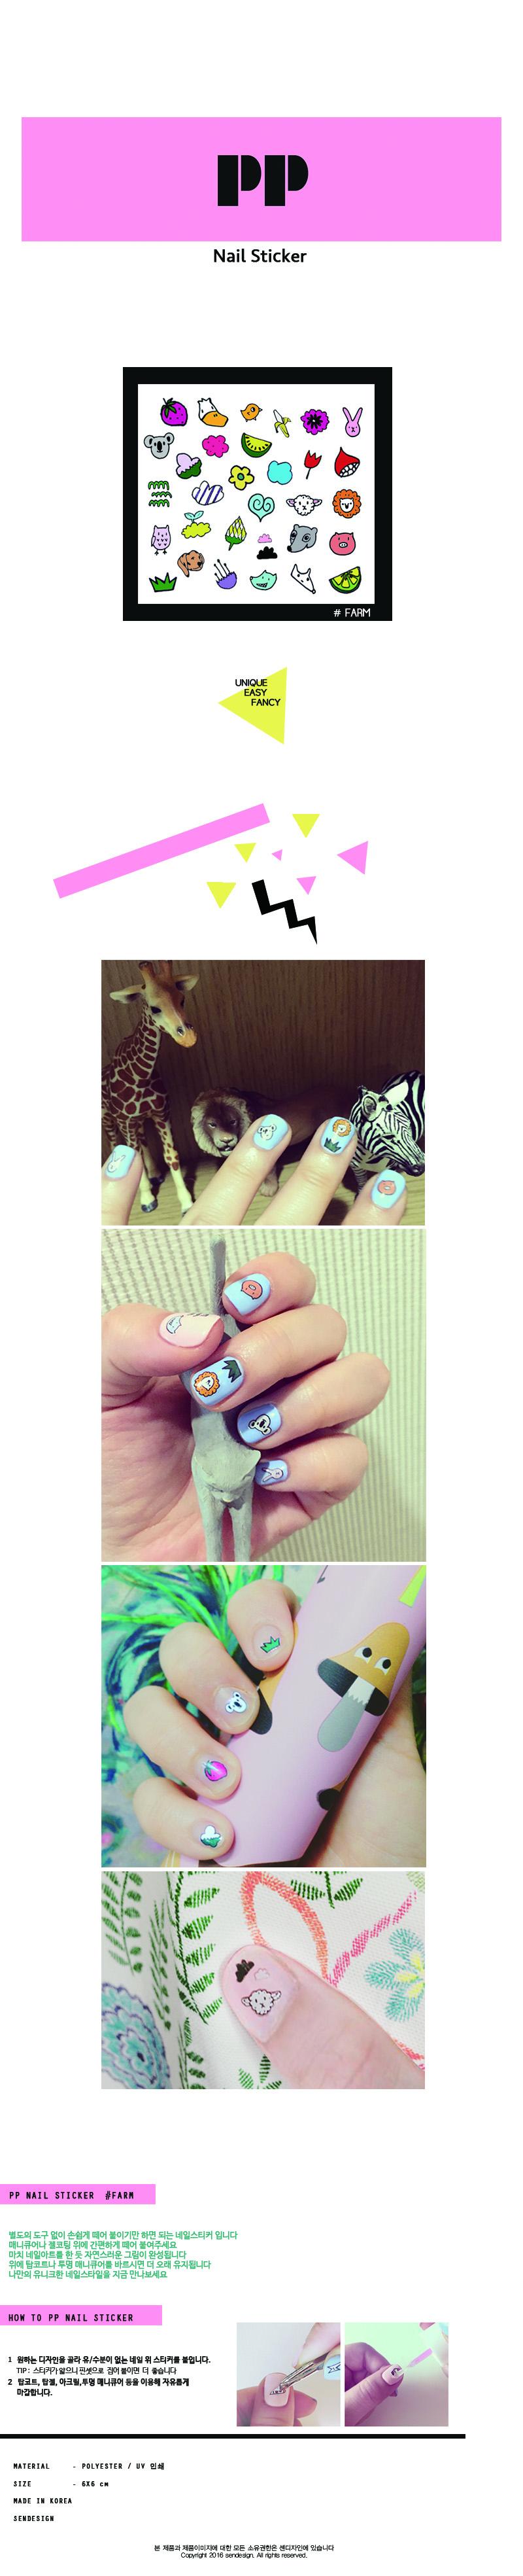 pp nail sticker - FARM - 센디자인, 3,500원, 네일, 네일스티커/파츠